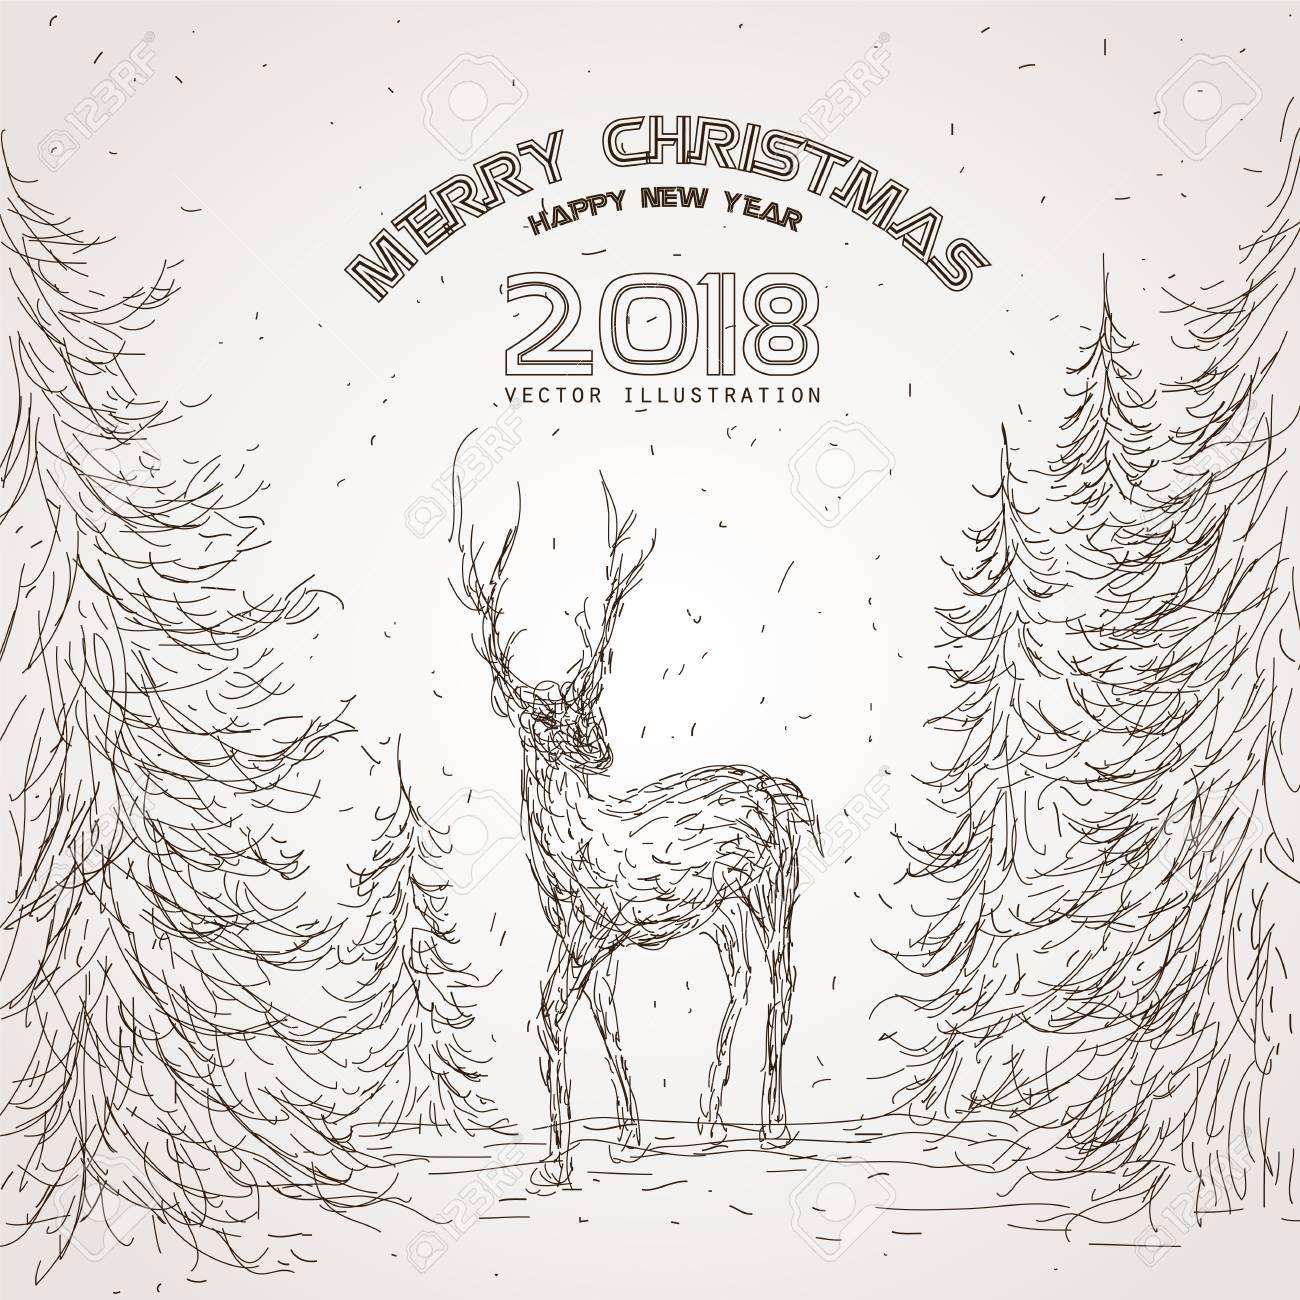 Vintage Christmas Illustrations.The Deer In The Forest The Vintage Christmas Illustrations